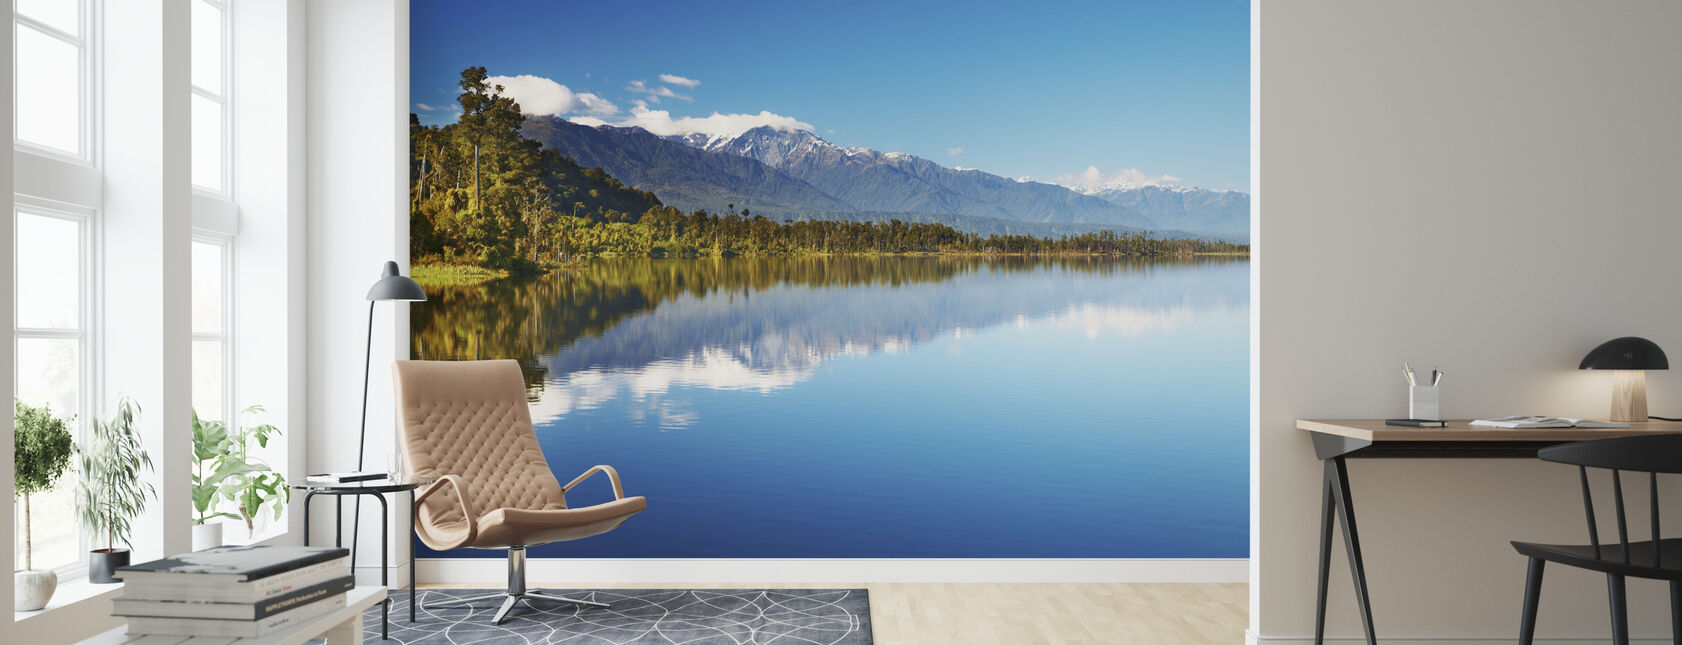 Beautiful lake, Nuova Zelanda - Carta da parati - Salotto